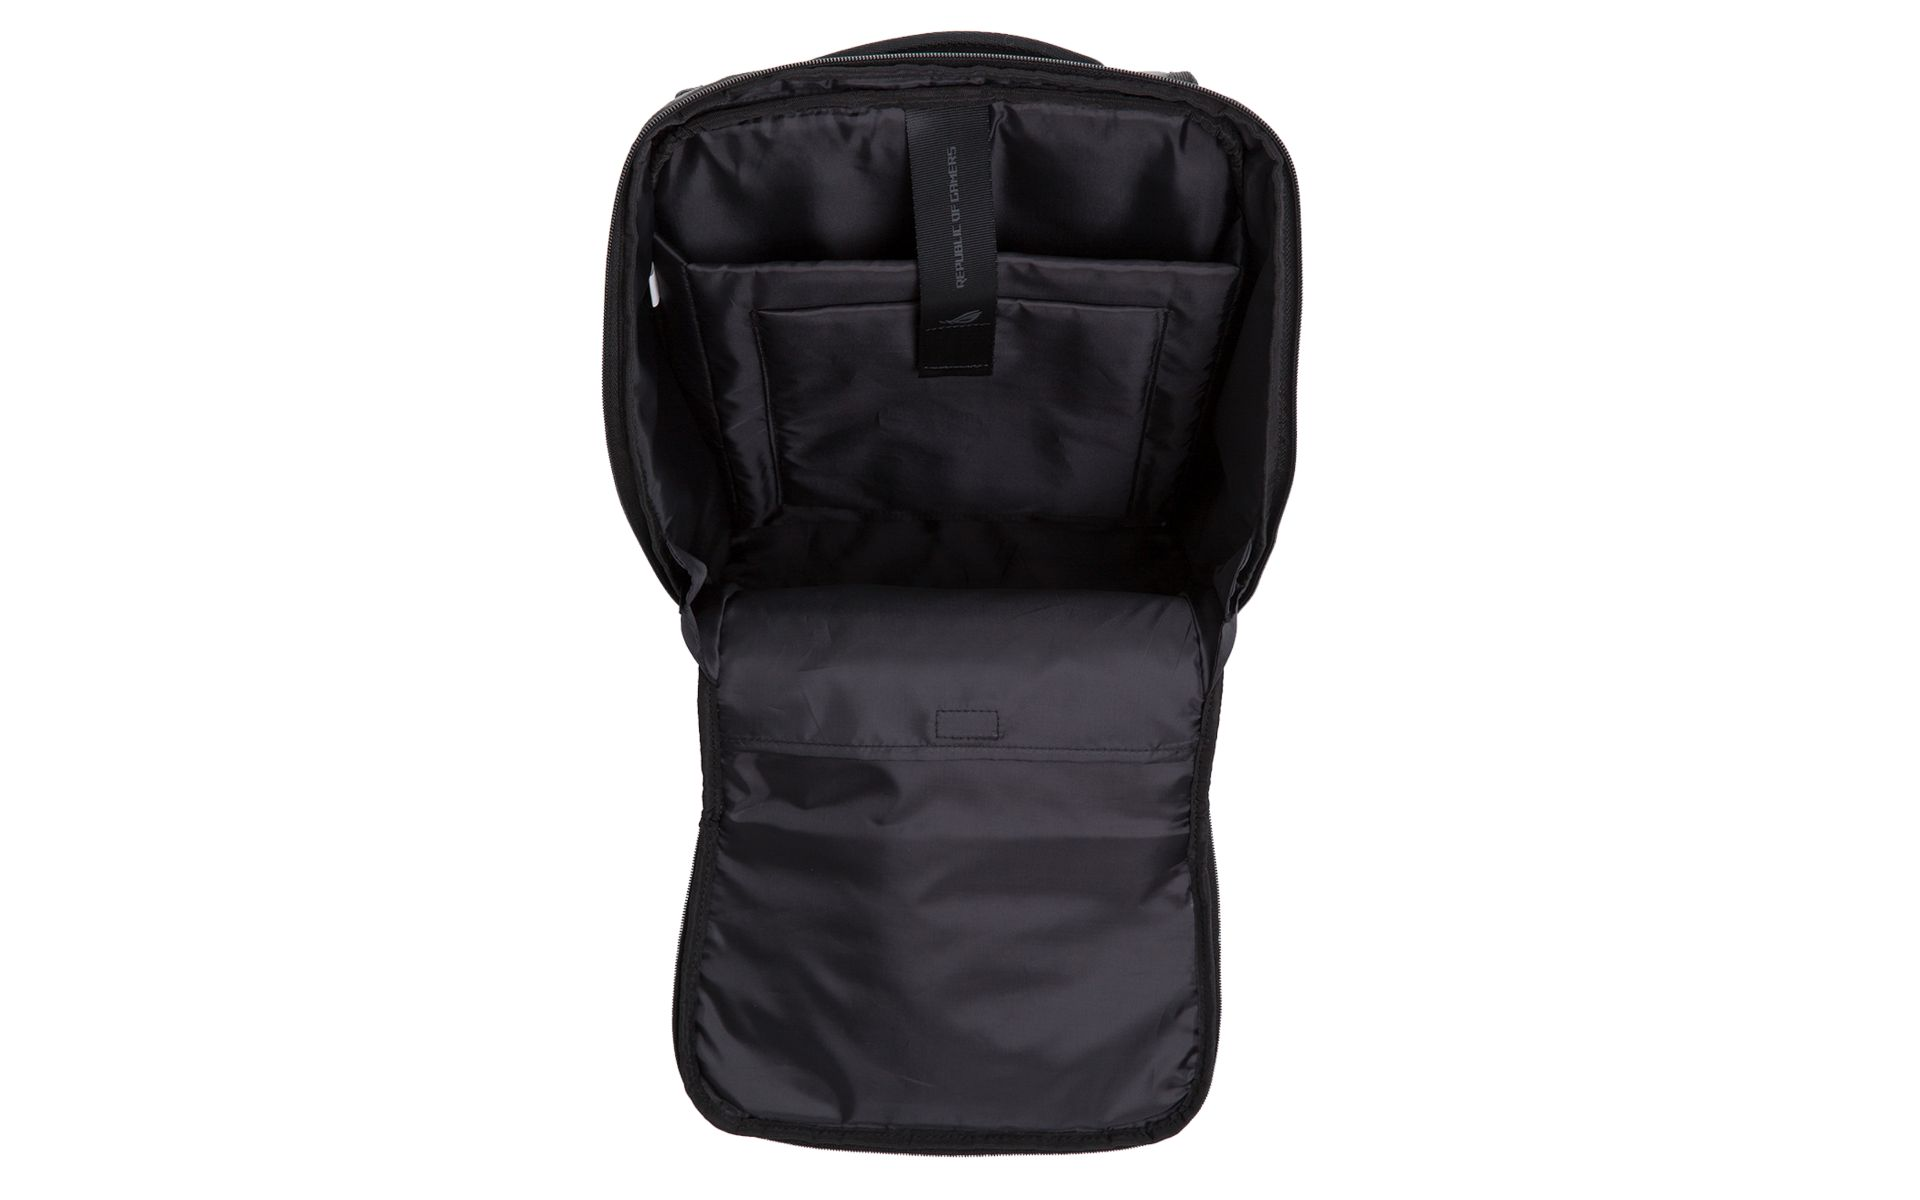 Balo ASUS ROG Ranger BP1500G Gaming Backpack